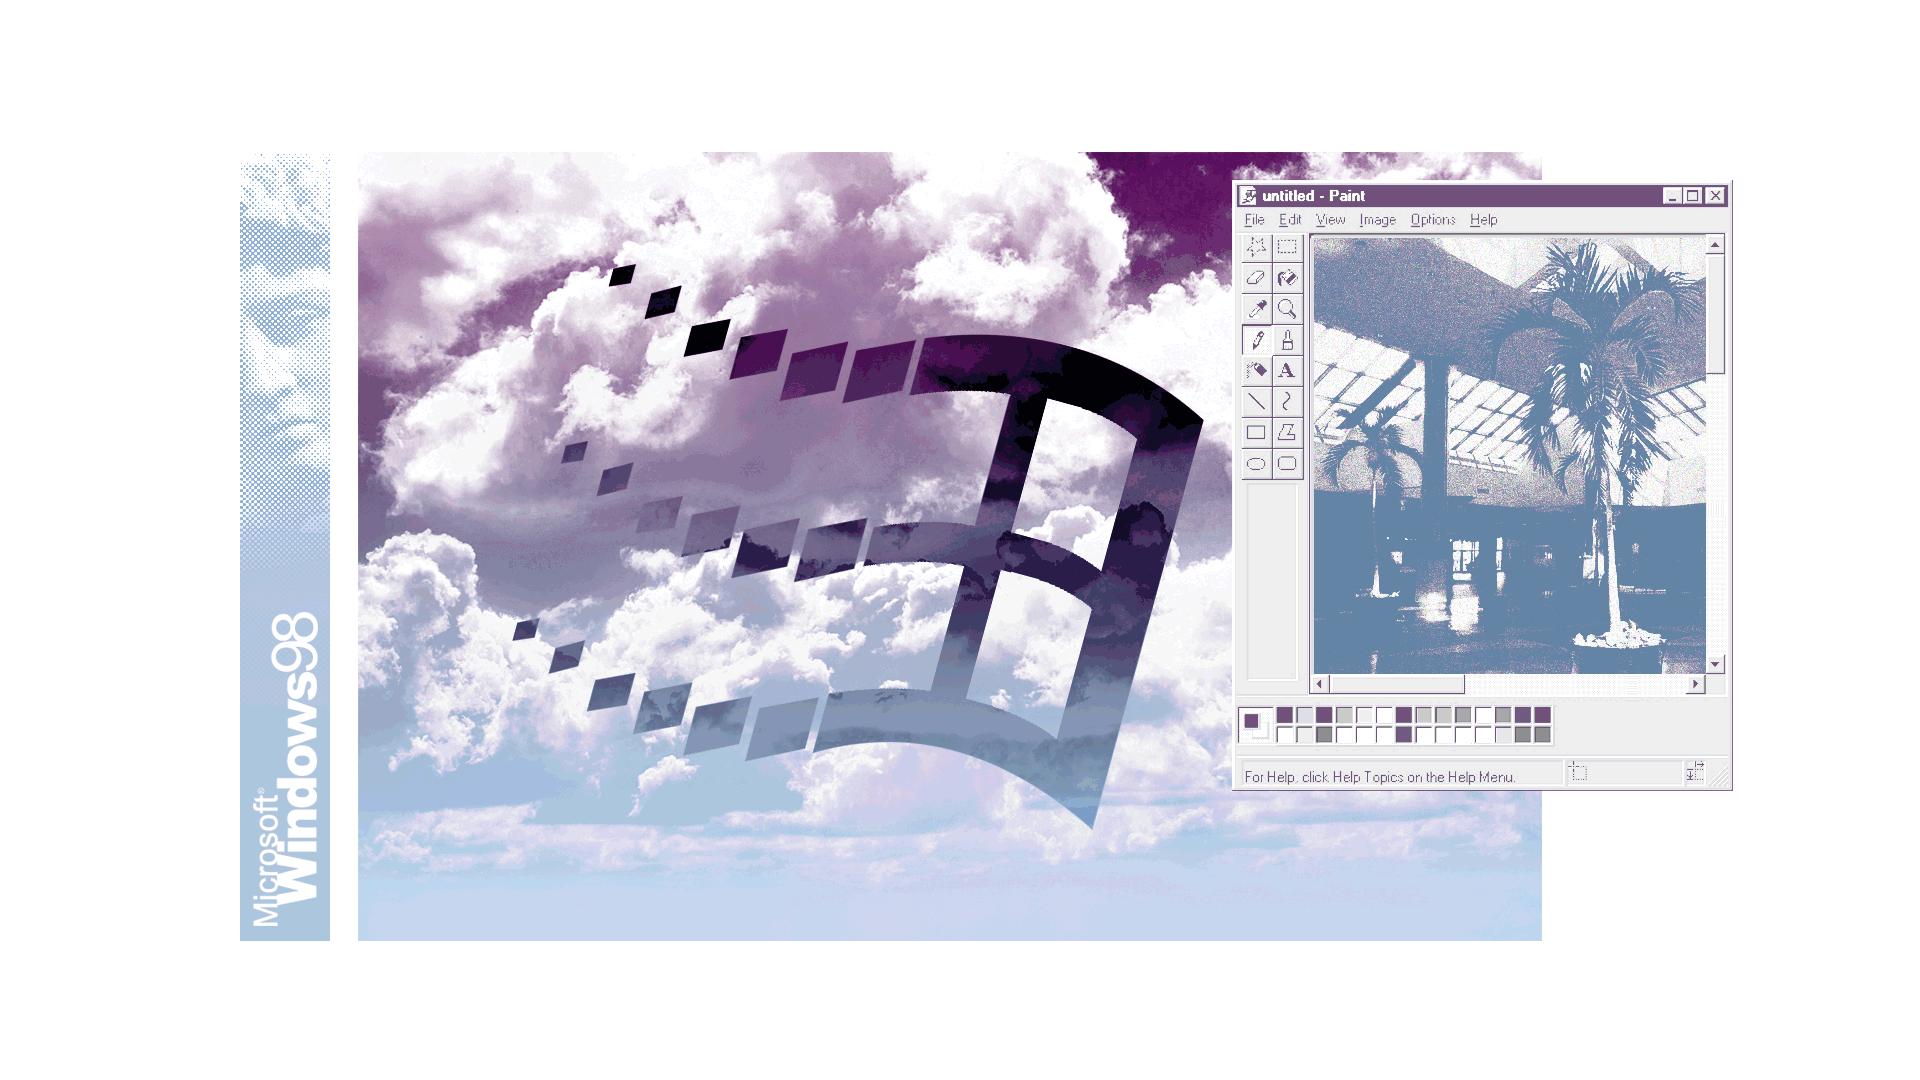 General 1920x1080 digital digital art Microsoft artwork floral shoppe vaporwave Microsoft Windows